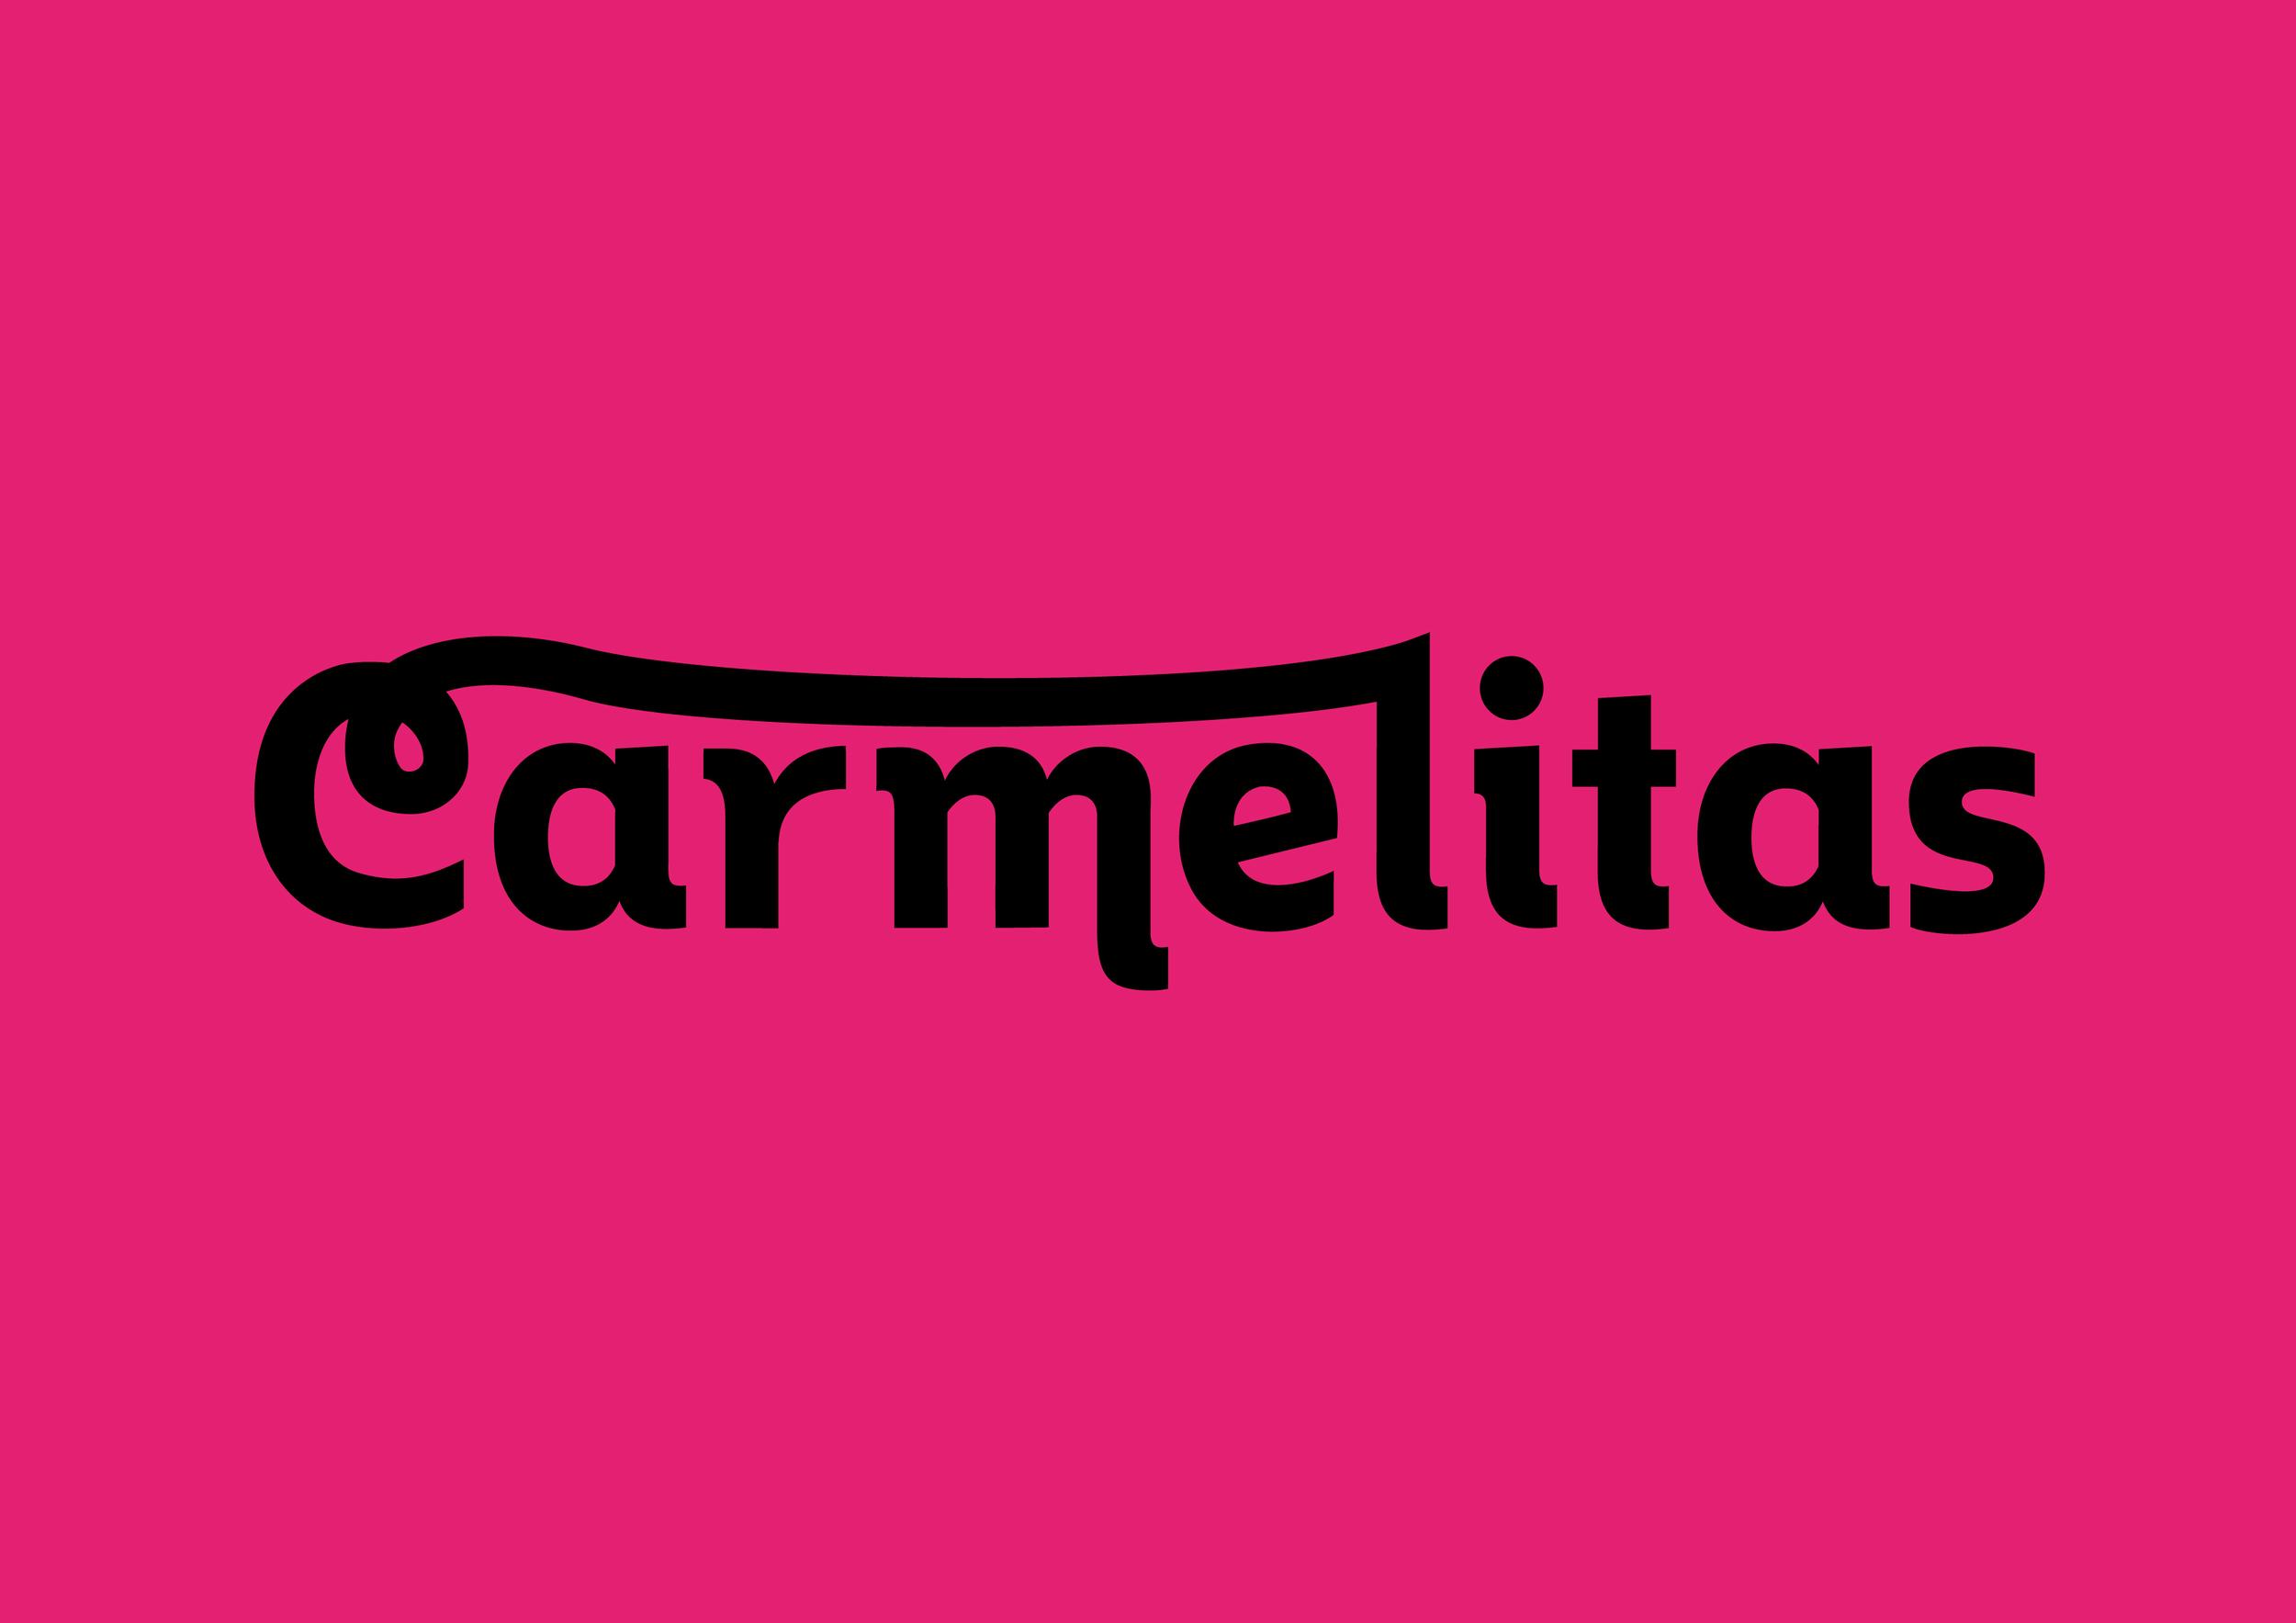 Carmelitas_mroca-20.jpg